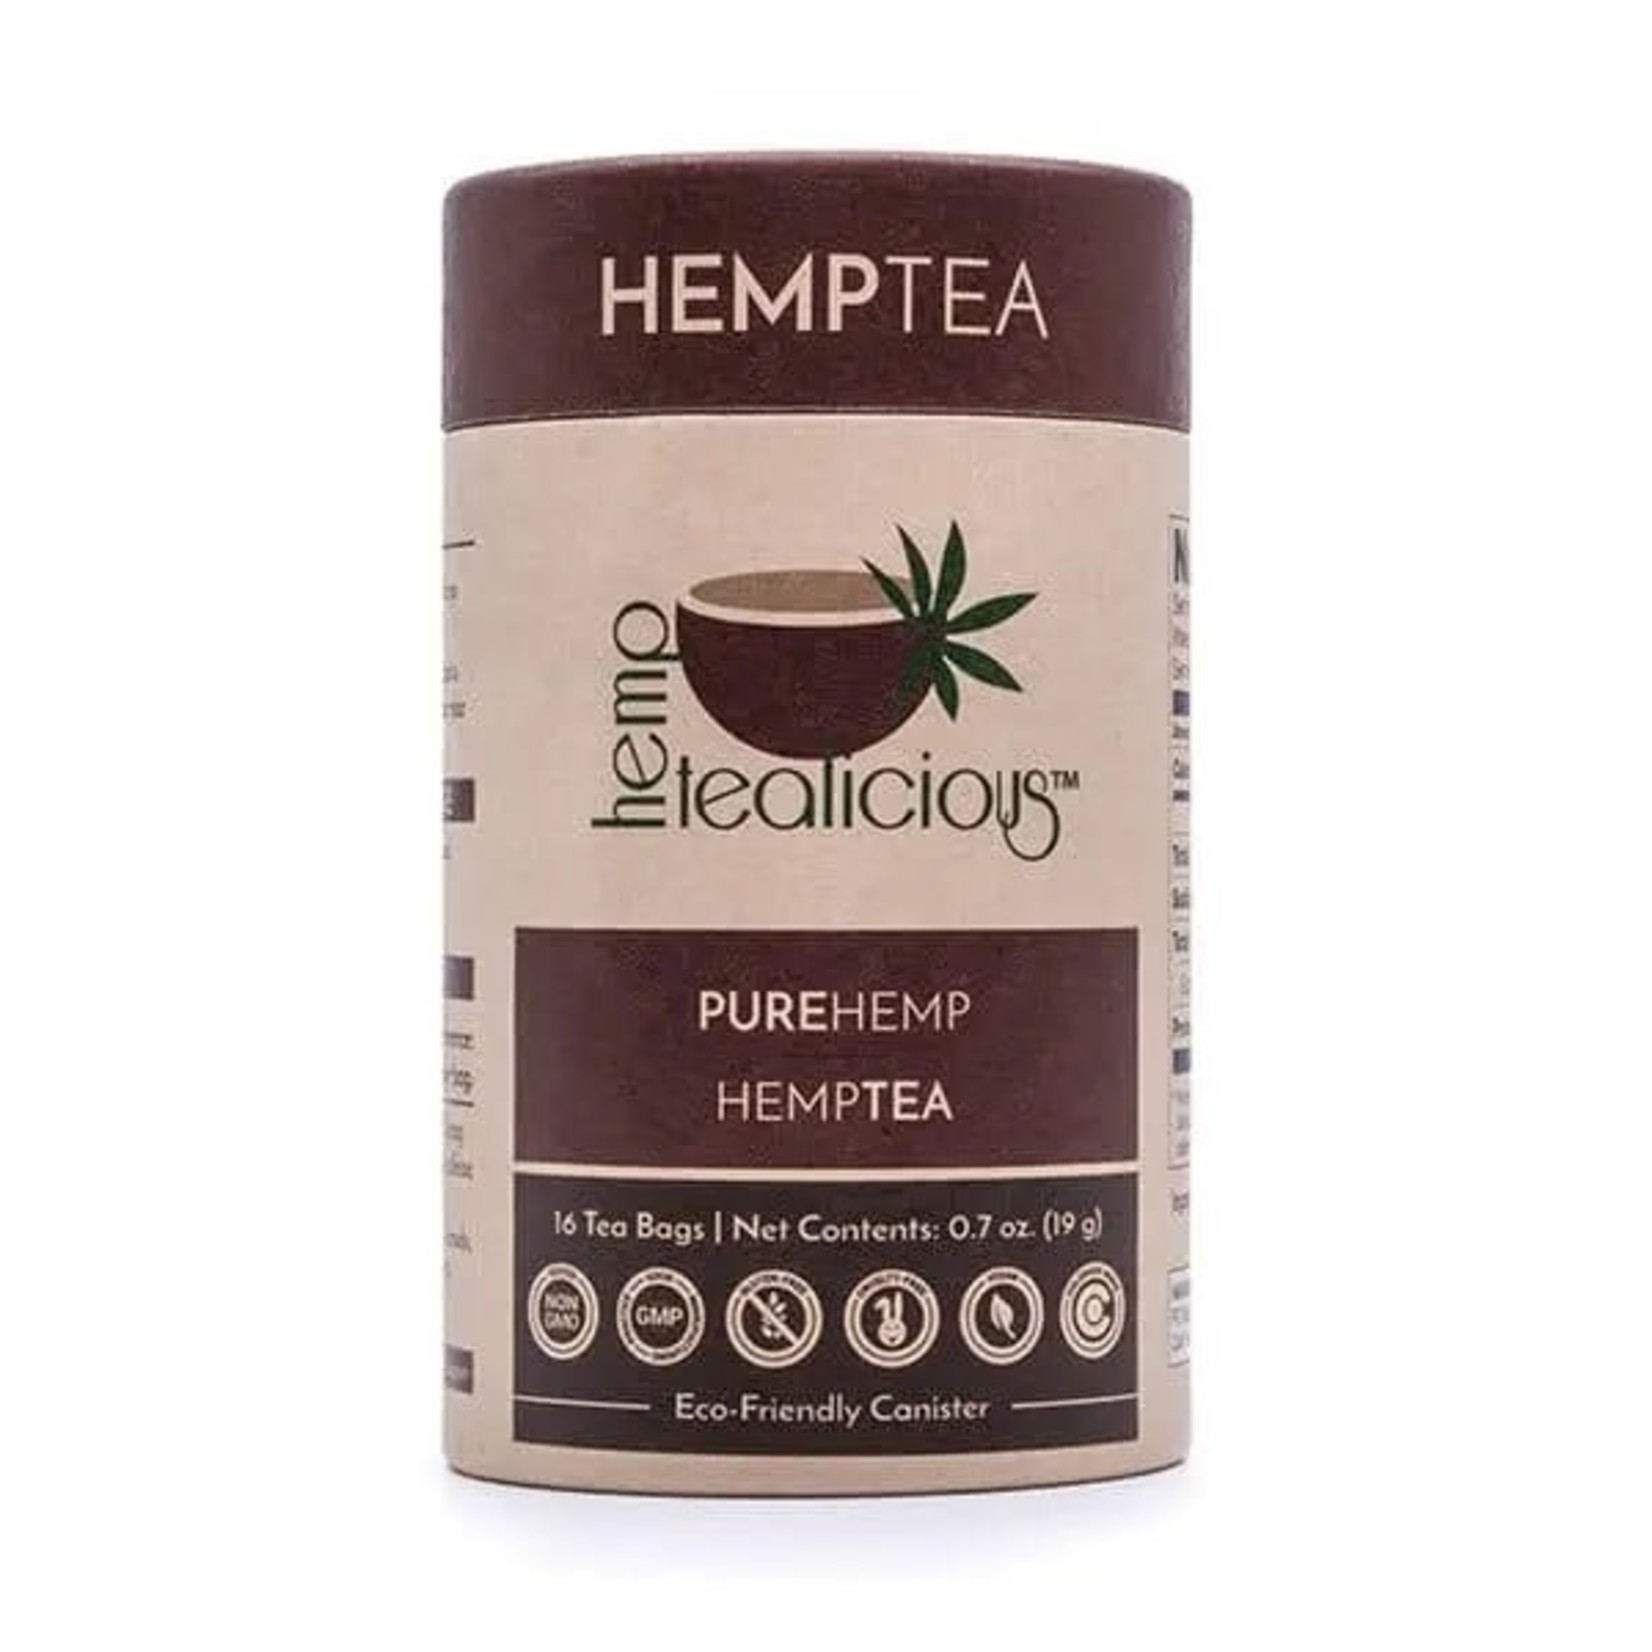 Pure Hemp Botanicals PHB Pure Hemp Tea Bags 16